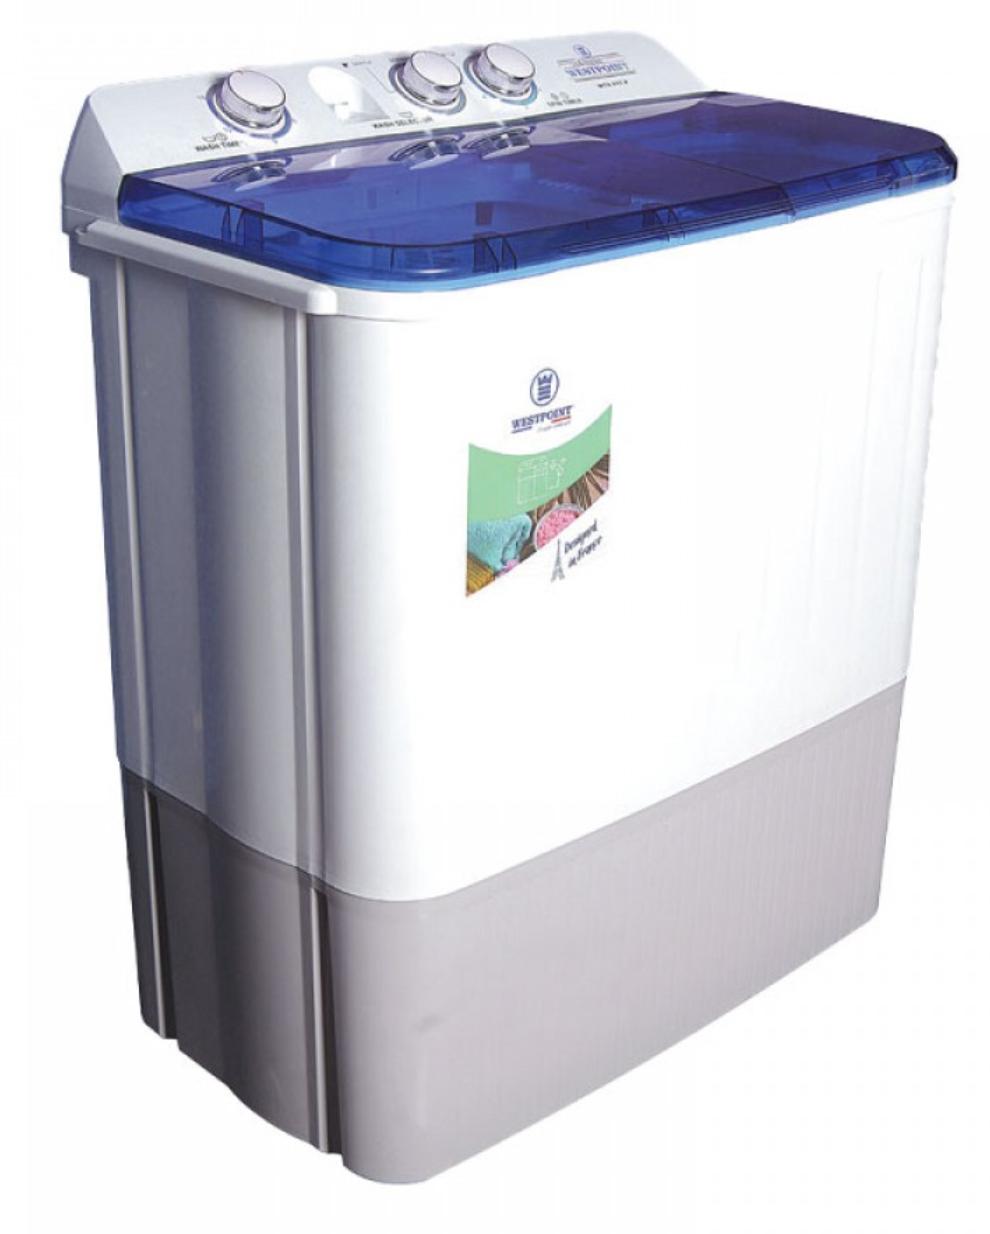 Westpoint Washing Machine 9kg Manual Twin Tub Top Load  Tanzania (White, WTX-917.P)